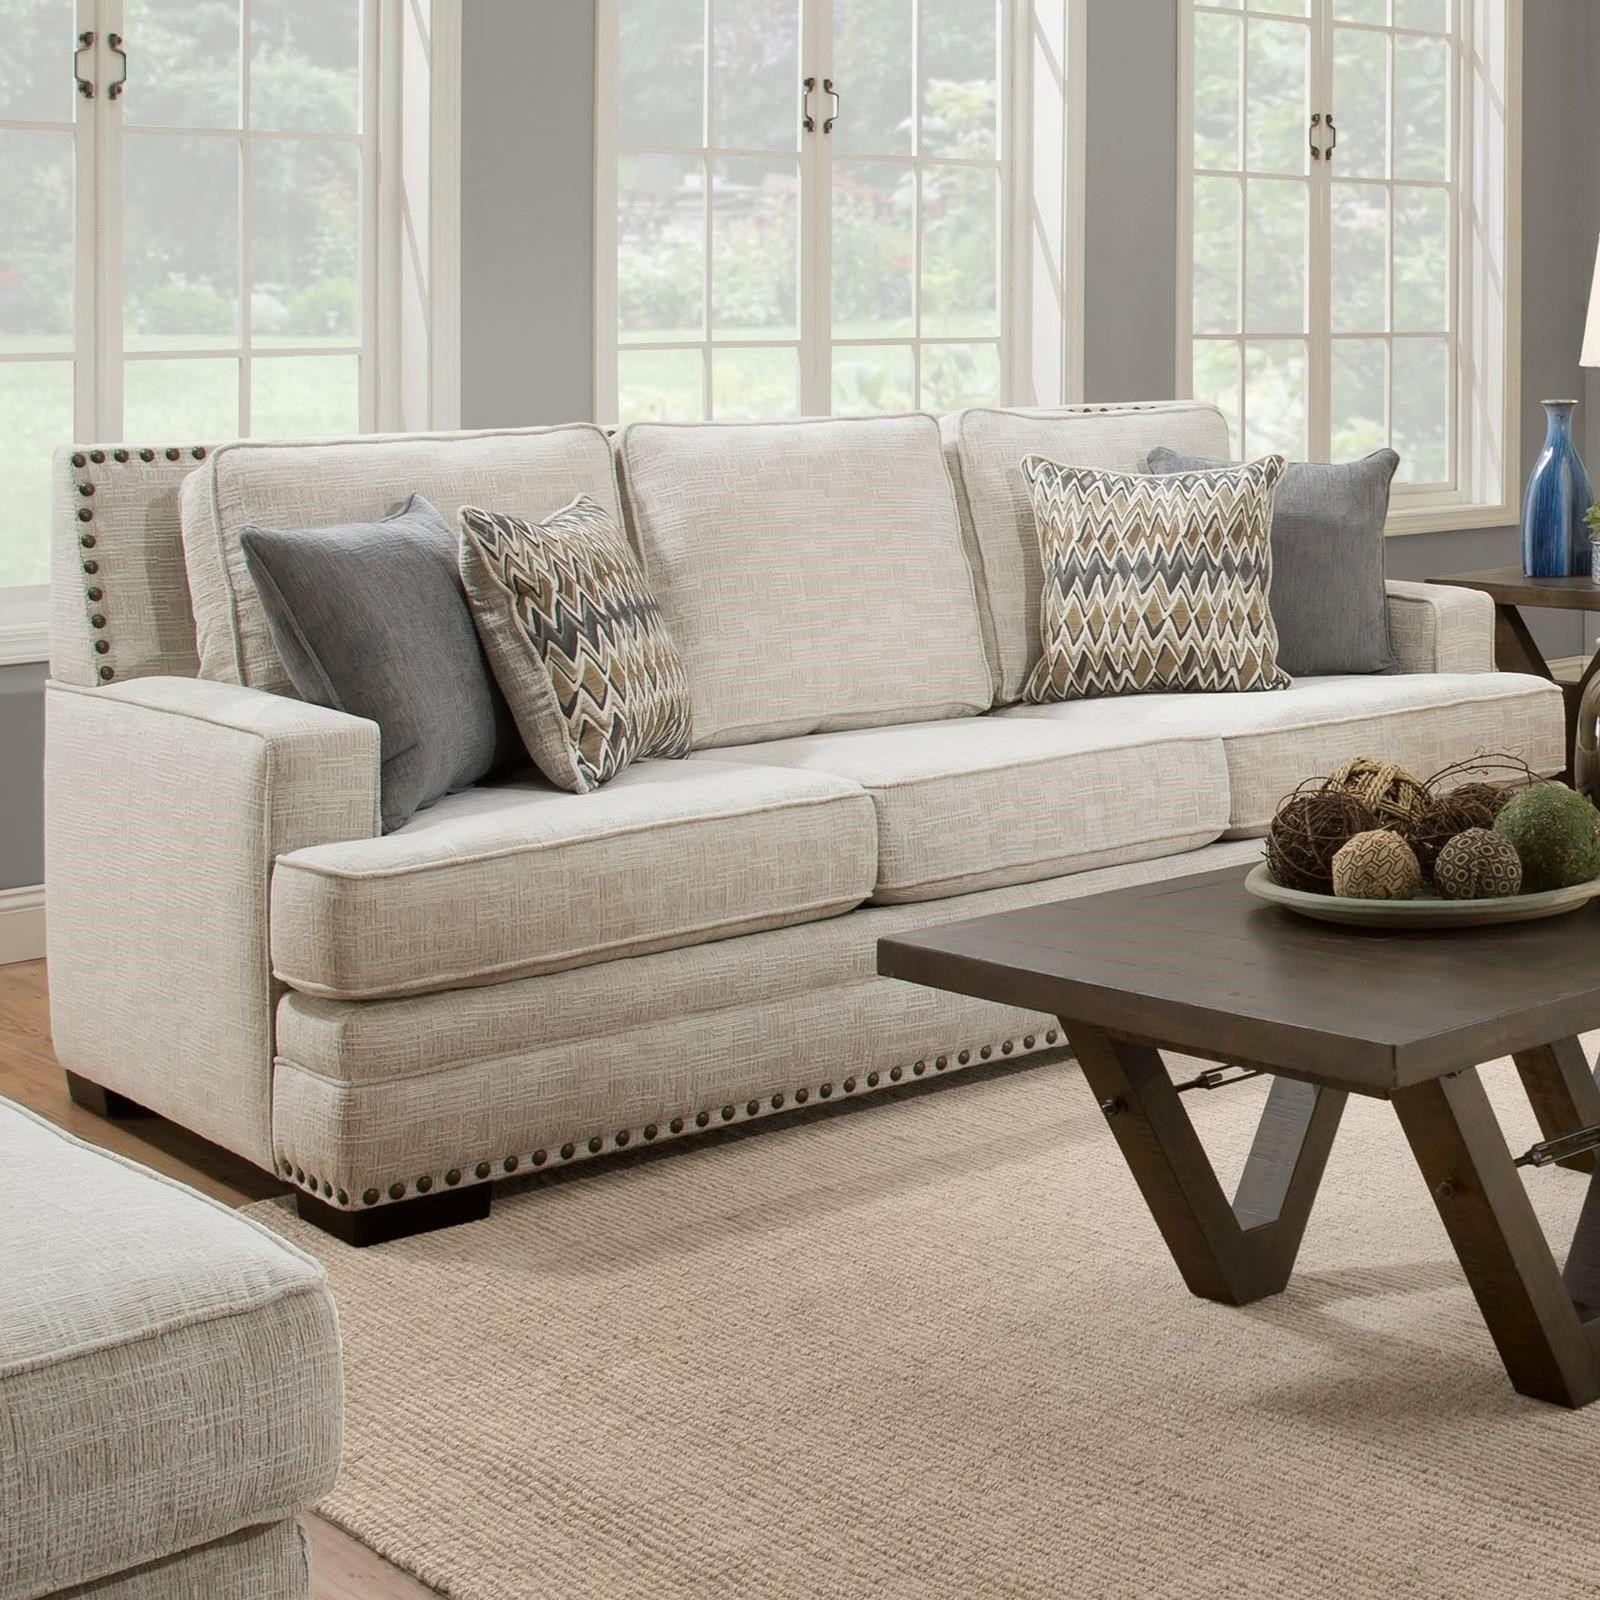 488 Sofa By Albany Cream Sofa Living Room Styles Paint